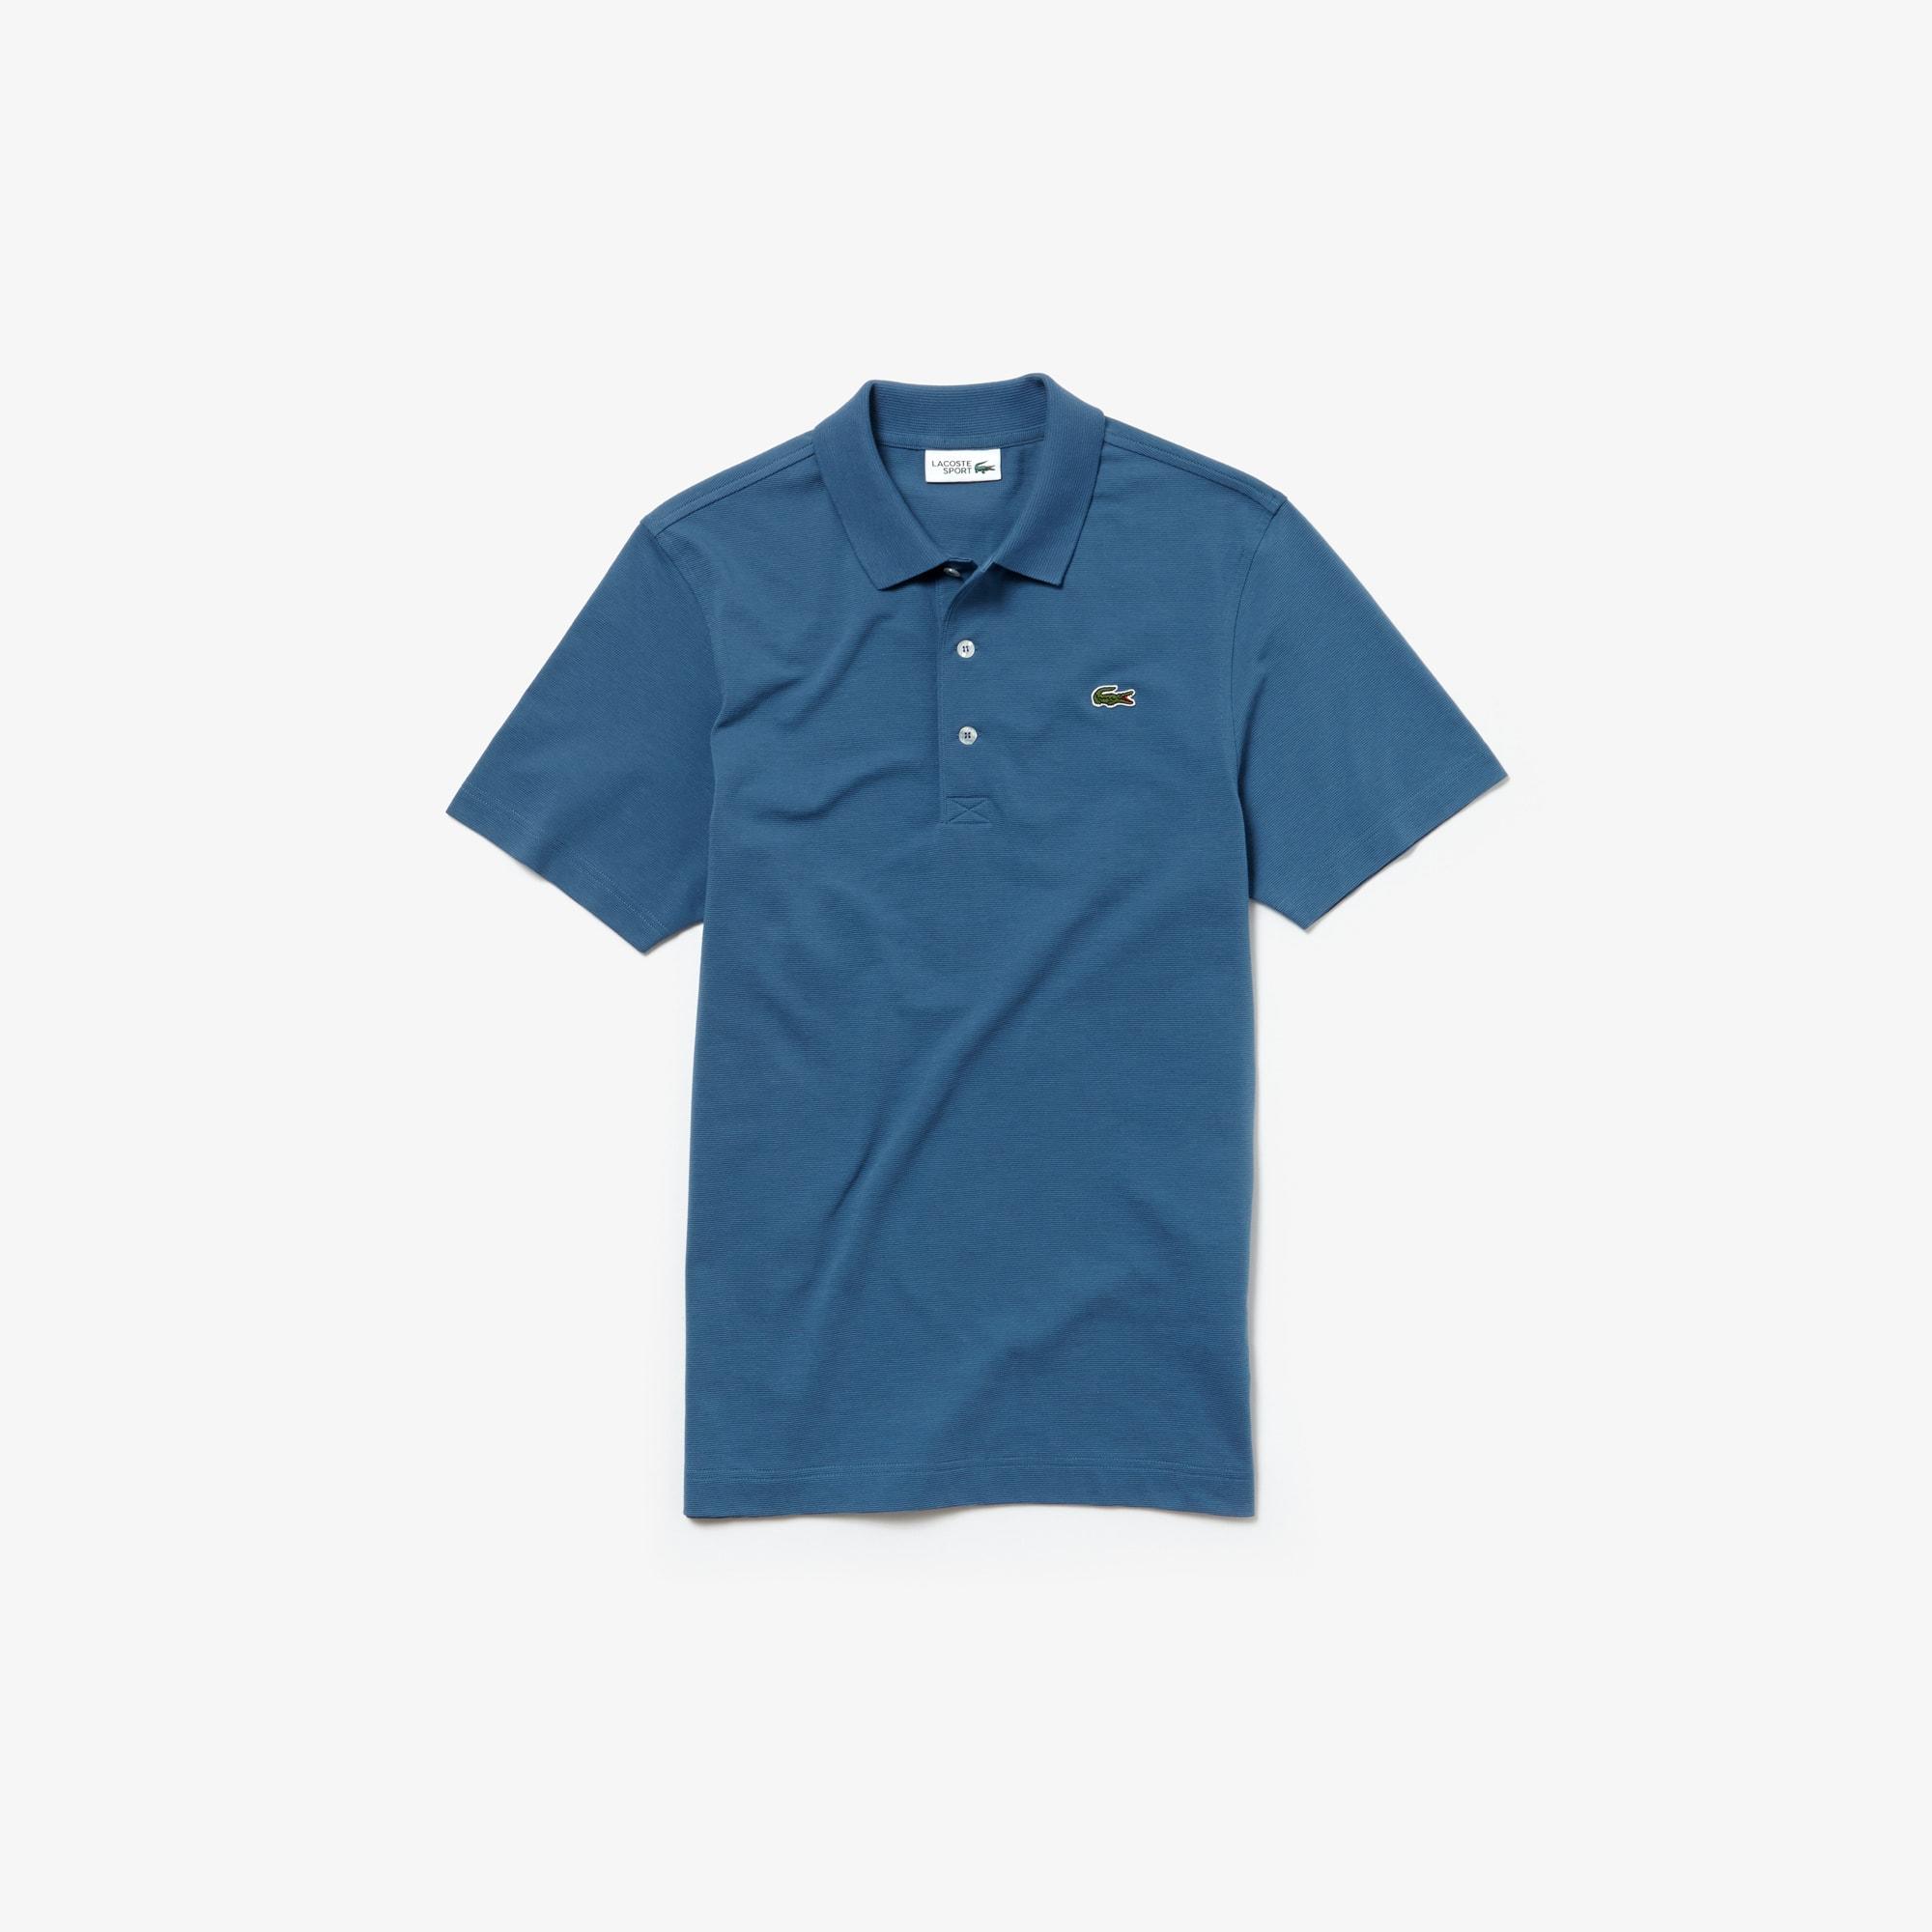 188ab23f6e0 Men s Lacoste SPORT Tennis regular fit Polo Shirt in ultra-lightweight knit